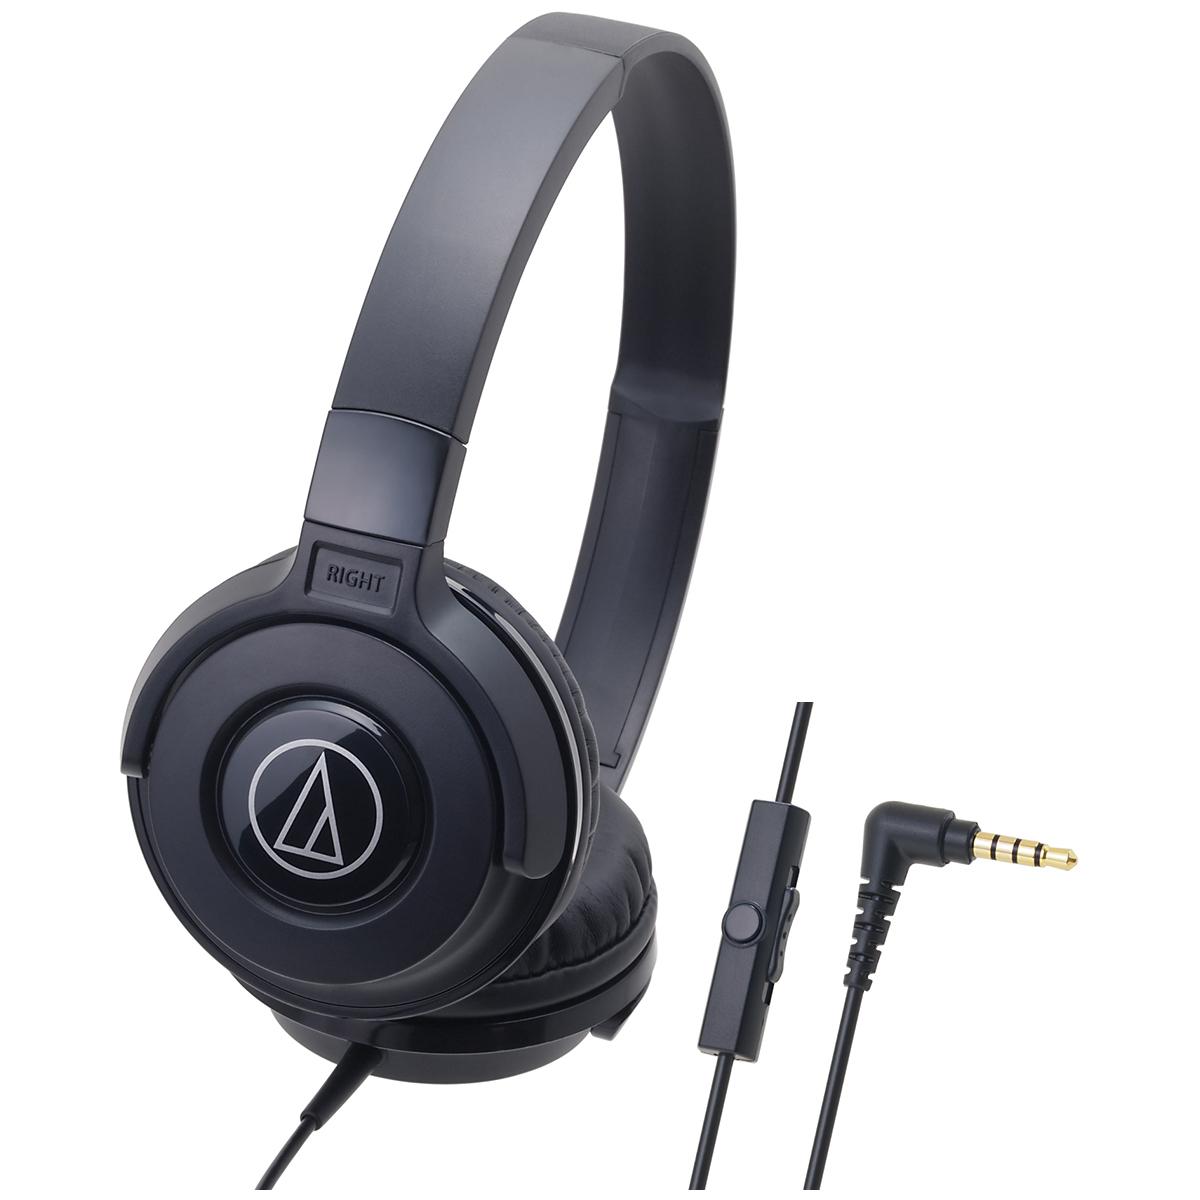 Audio-technica Headphone + USB Microphone Bundle ATR2100X/ATH-S100 image 3